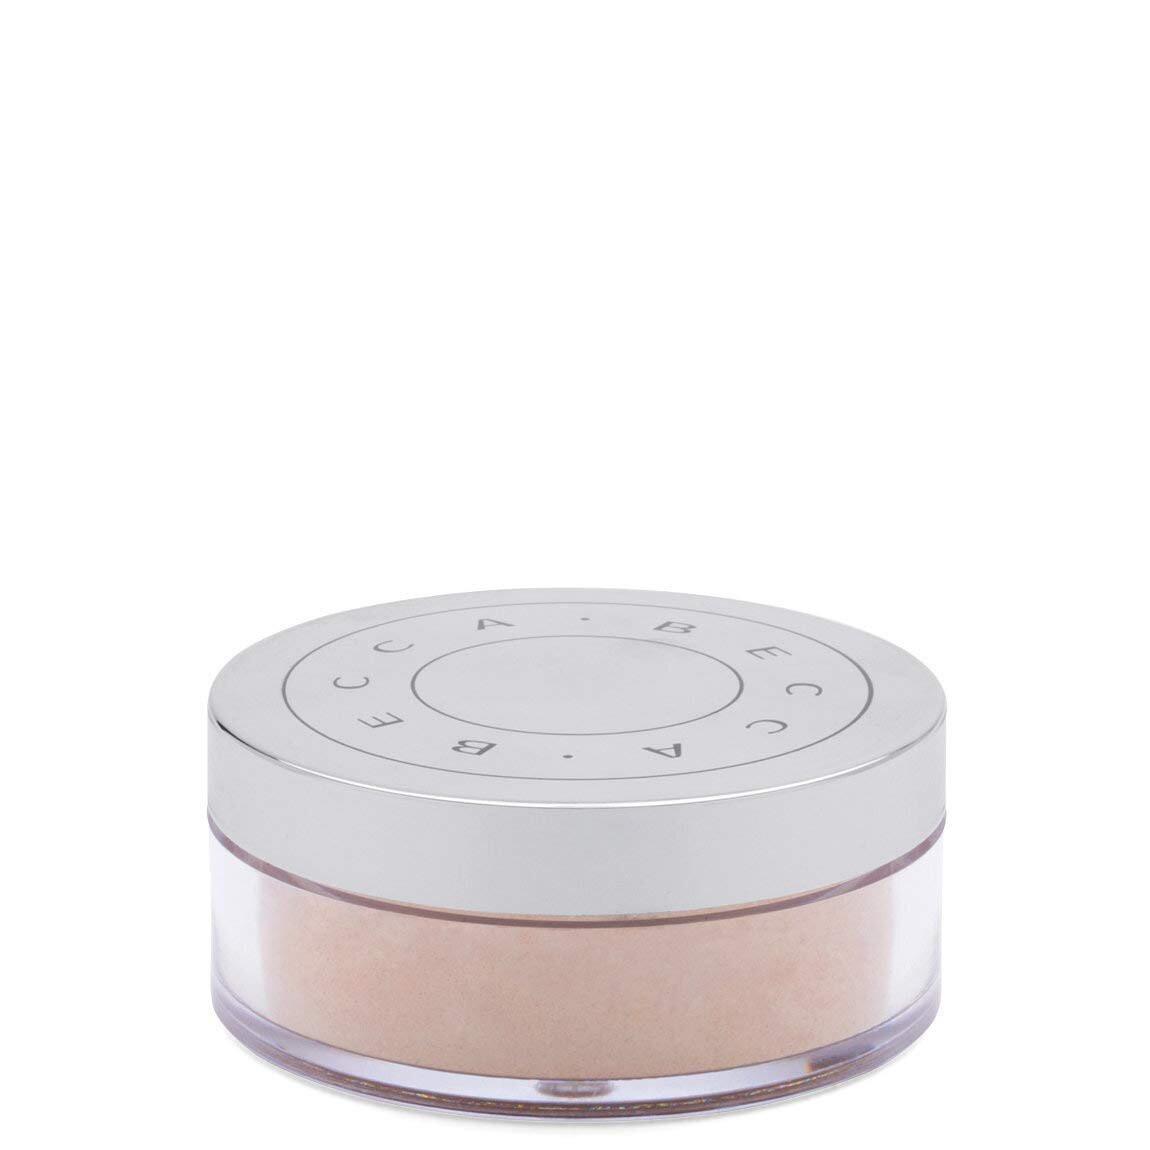 Пудра BECCA  Hydra-Mist Set & Refresh Powder 1.5g